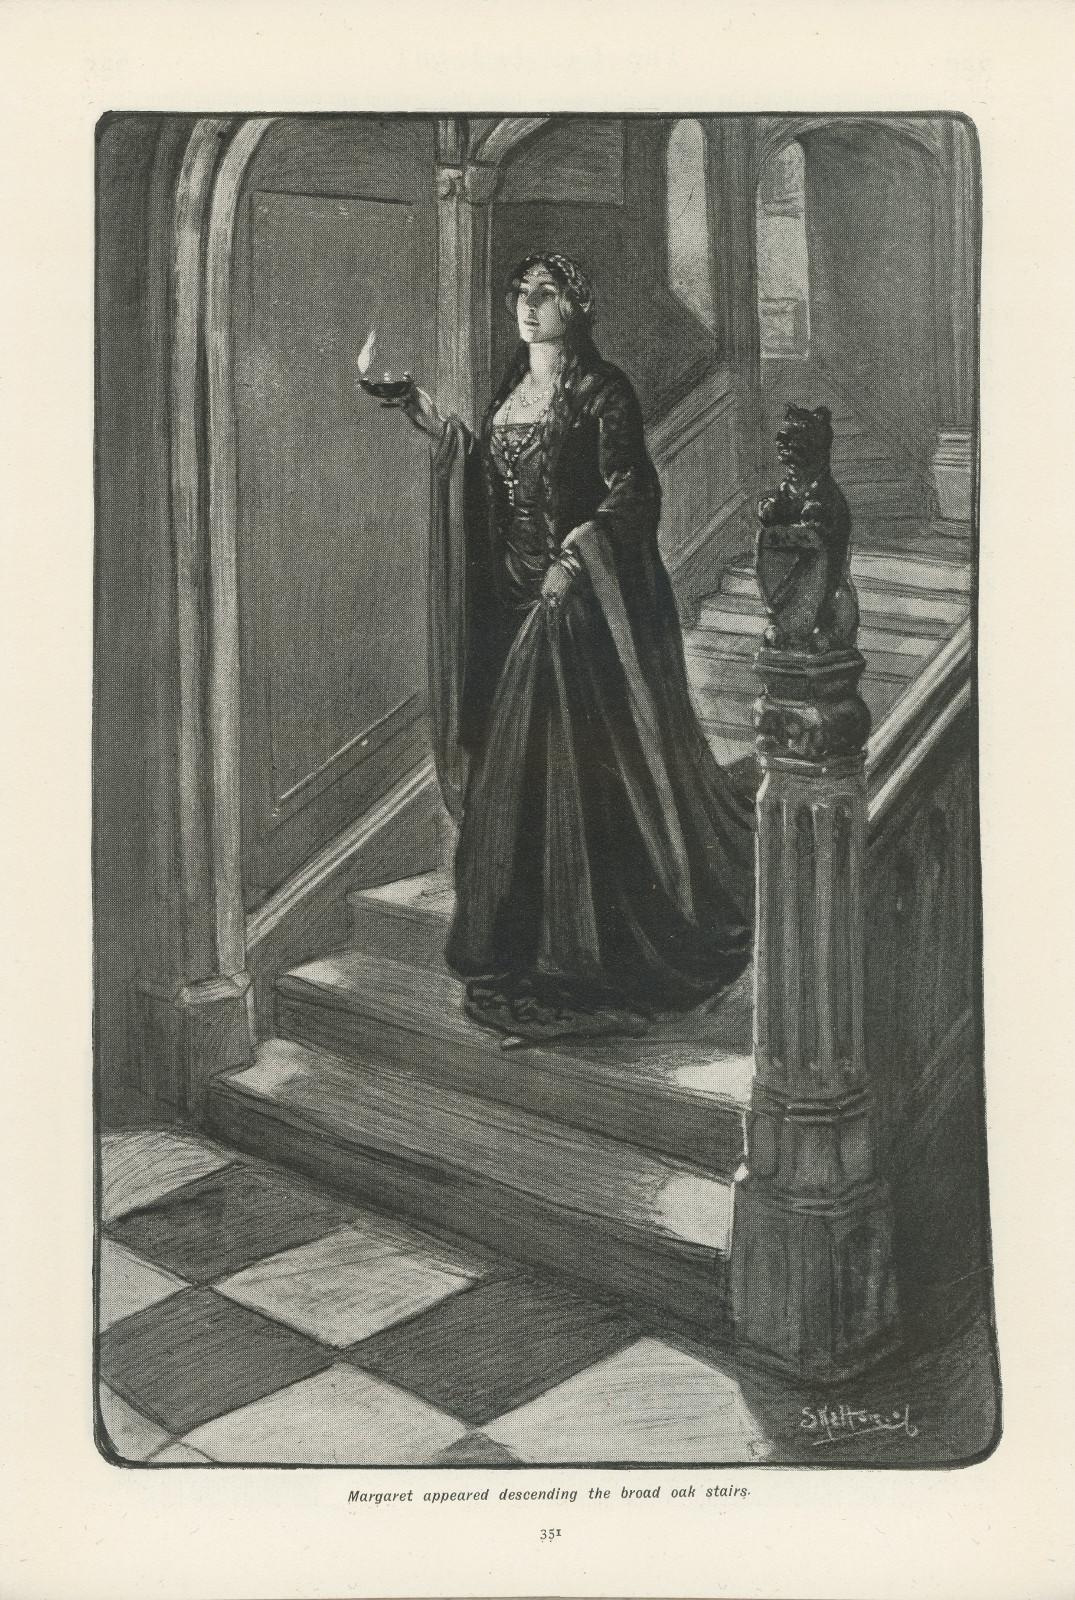 Margaretappearedladysrealm351